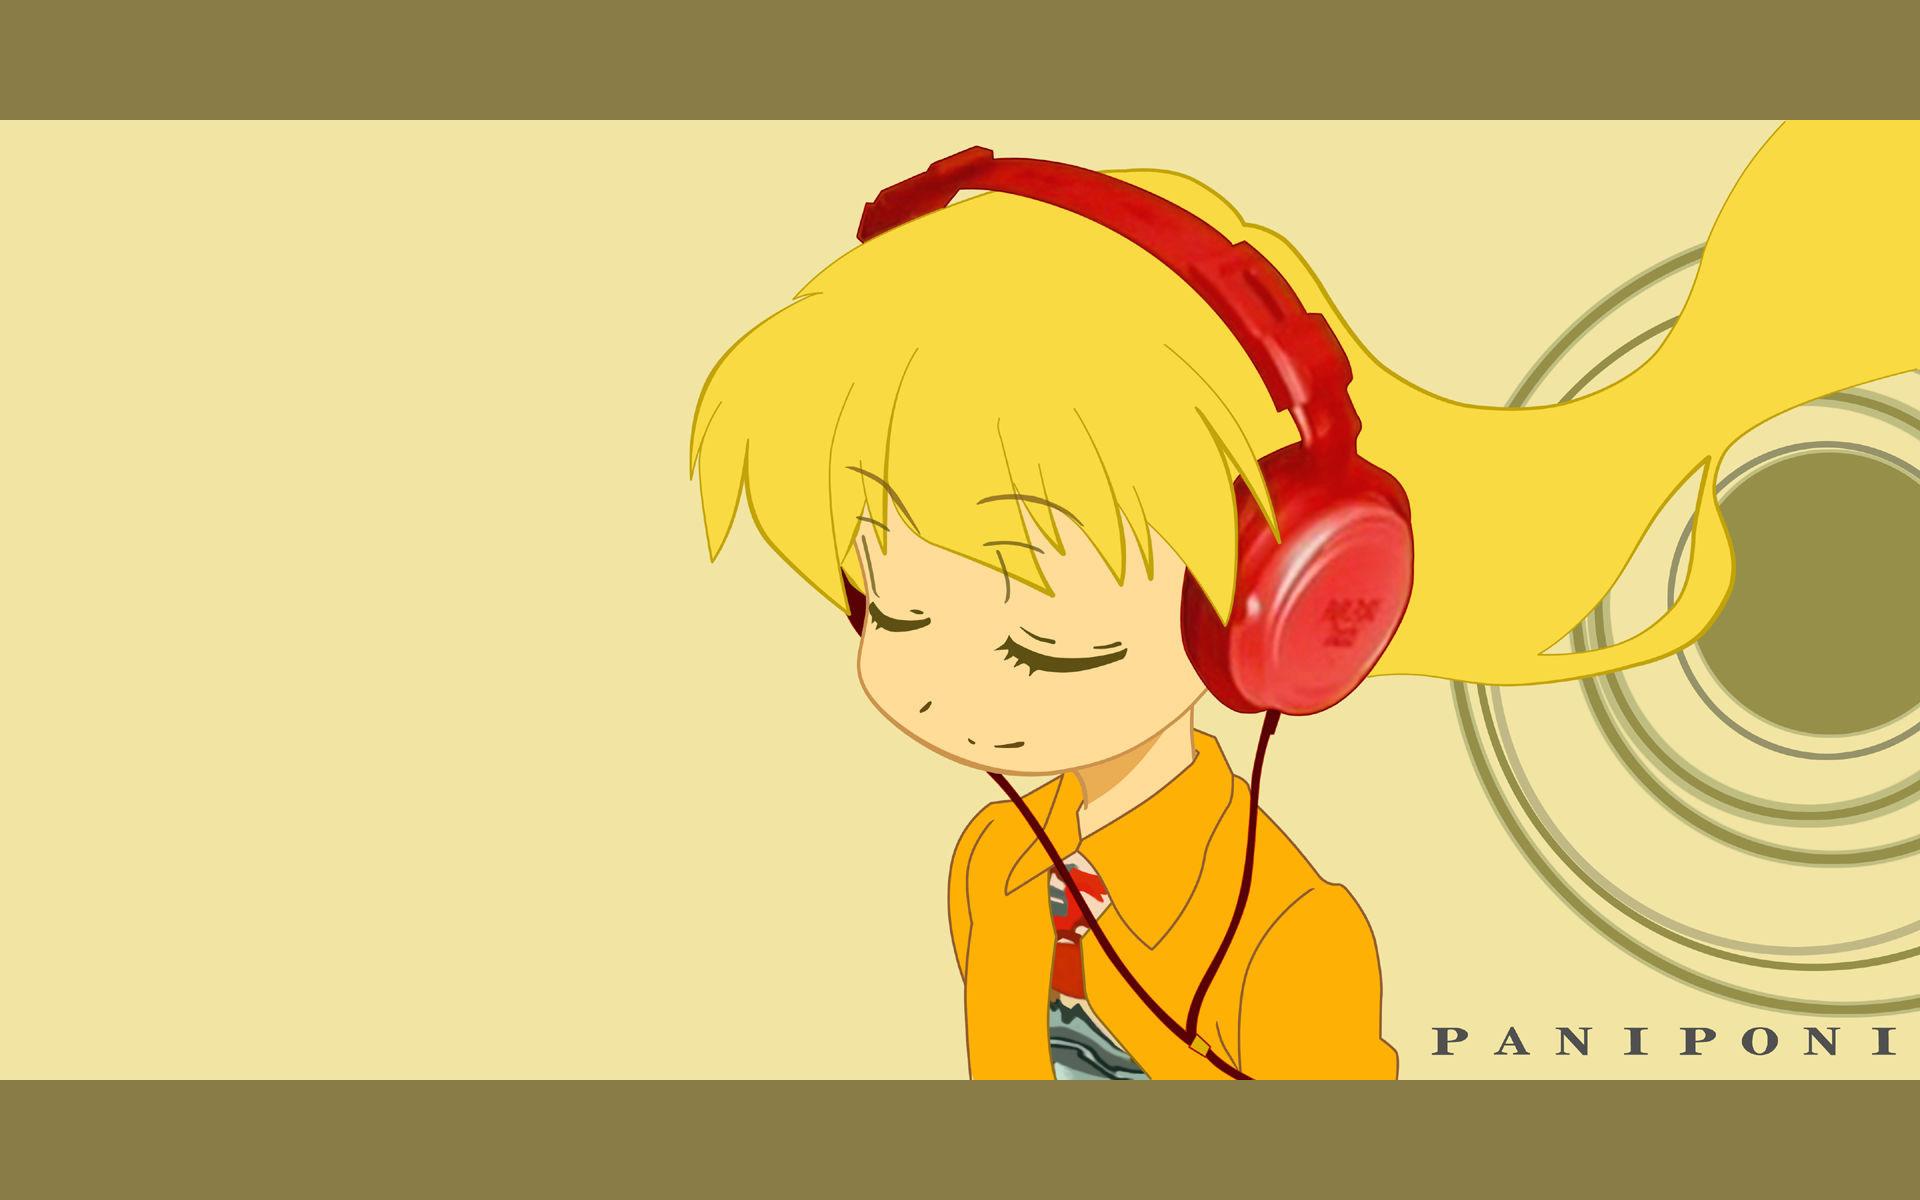 headphones pani_poni_dash rebecca_miyamoto